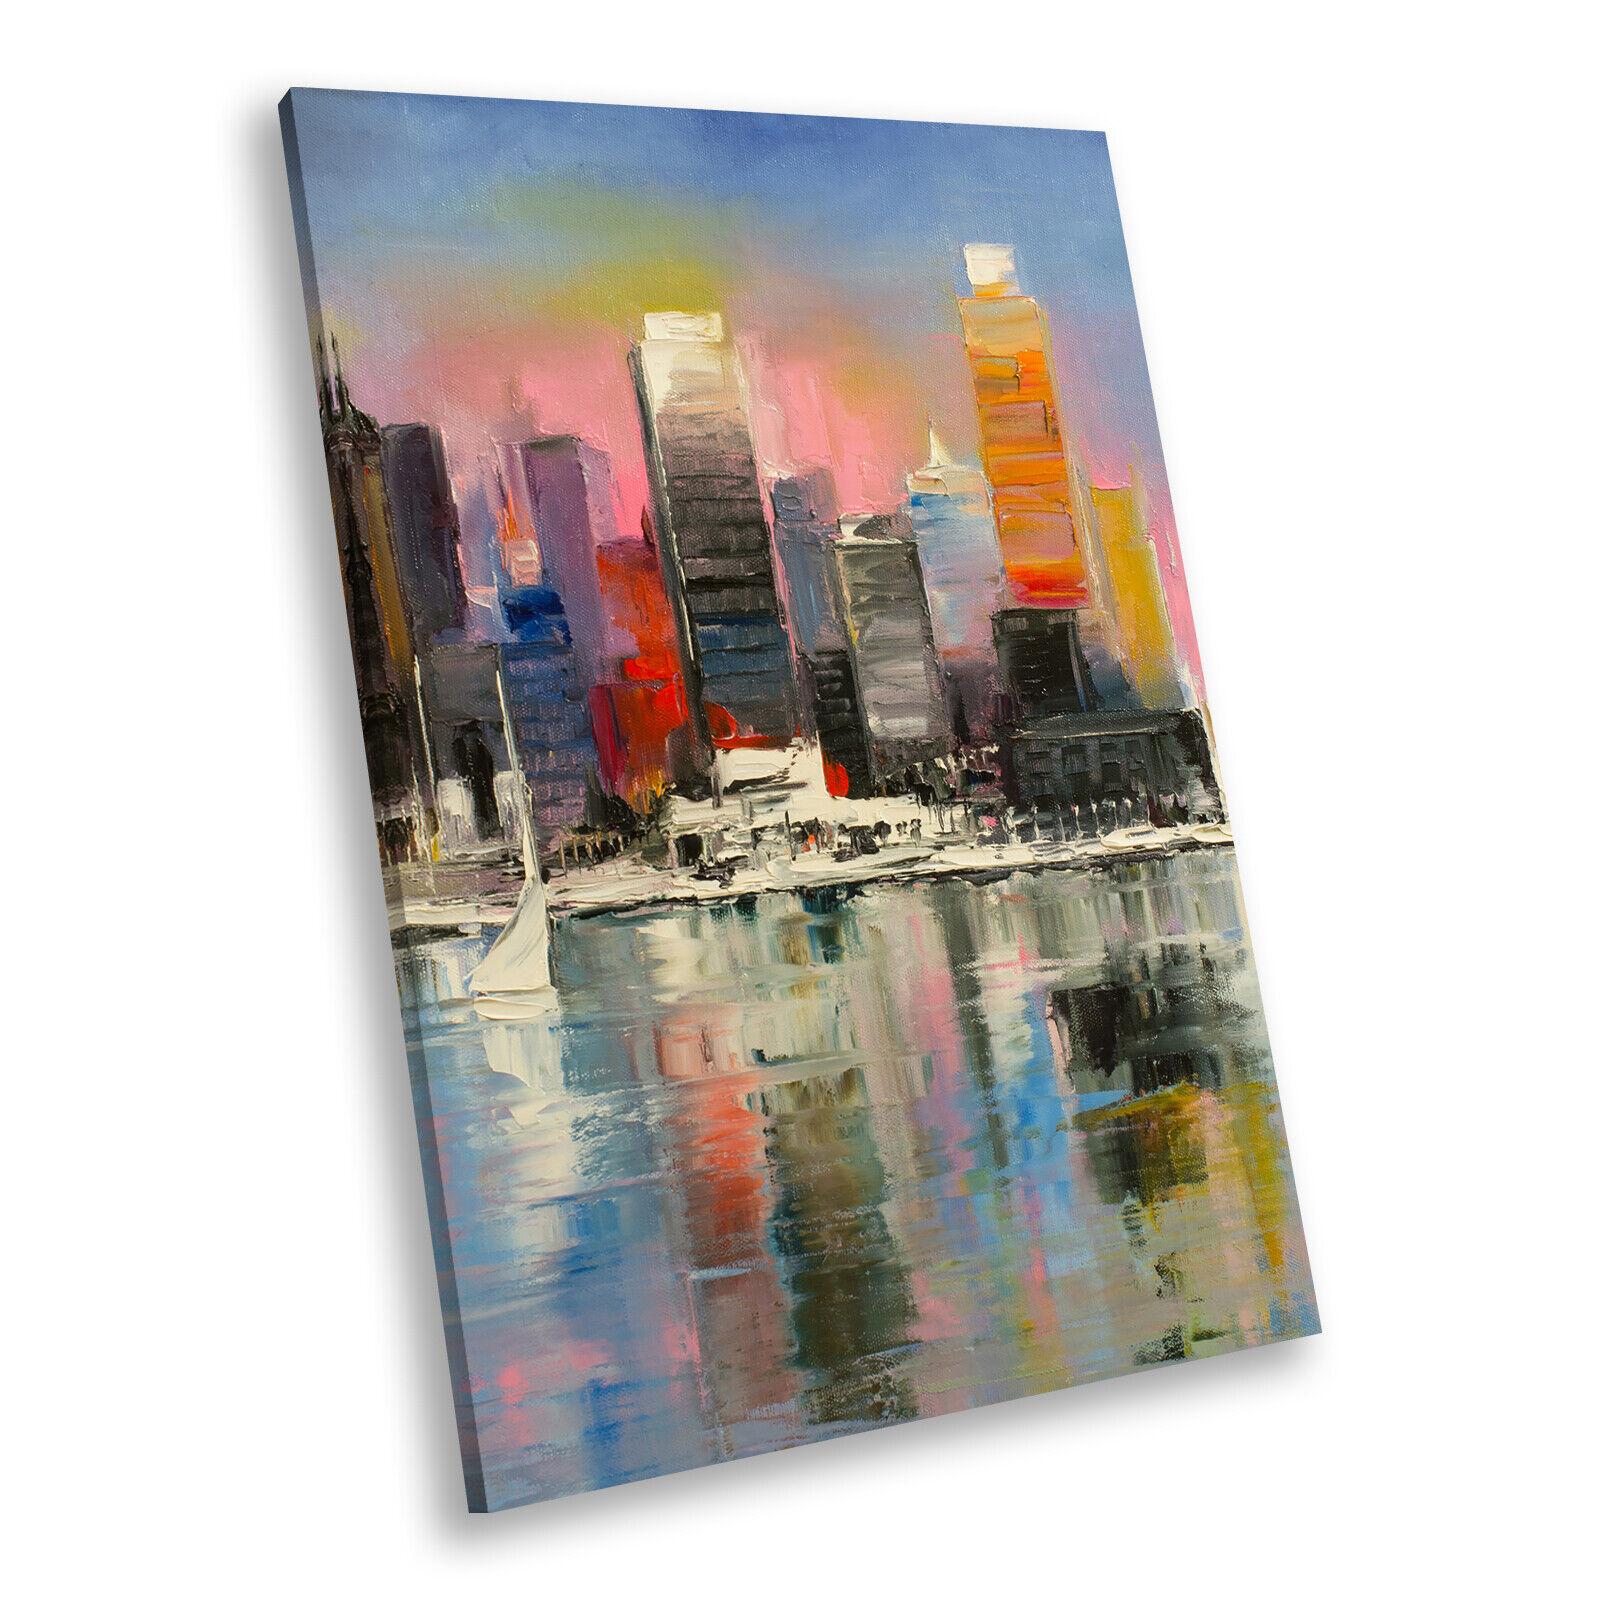 Colourful Retro City Skyline Portrait Scenic Canvas Framed Art Picture